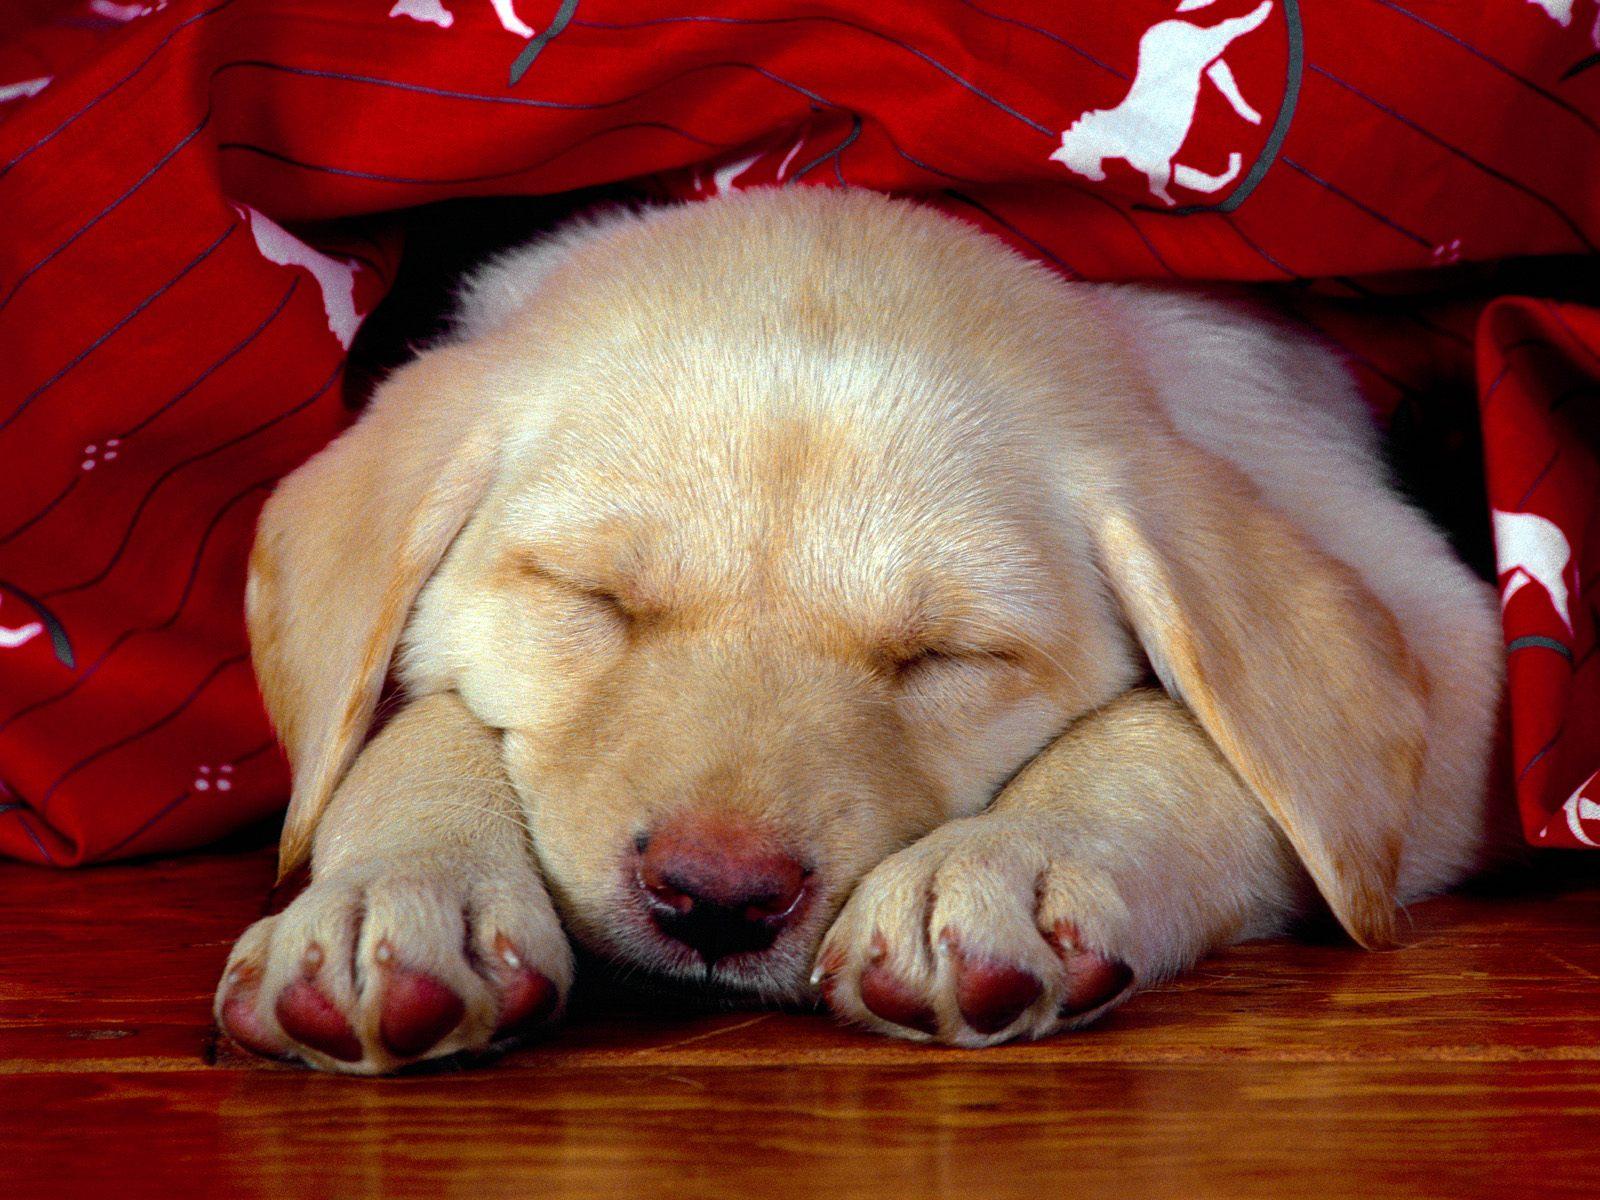 http://3.bp.blogspot.com/-RgrPvA_K4yQ/T9mVZCv3k0I/AAAAAAAAGzg/jKNLHp6k7Cc/s1600/Dog+Wallpaper+065.jpg